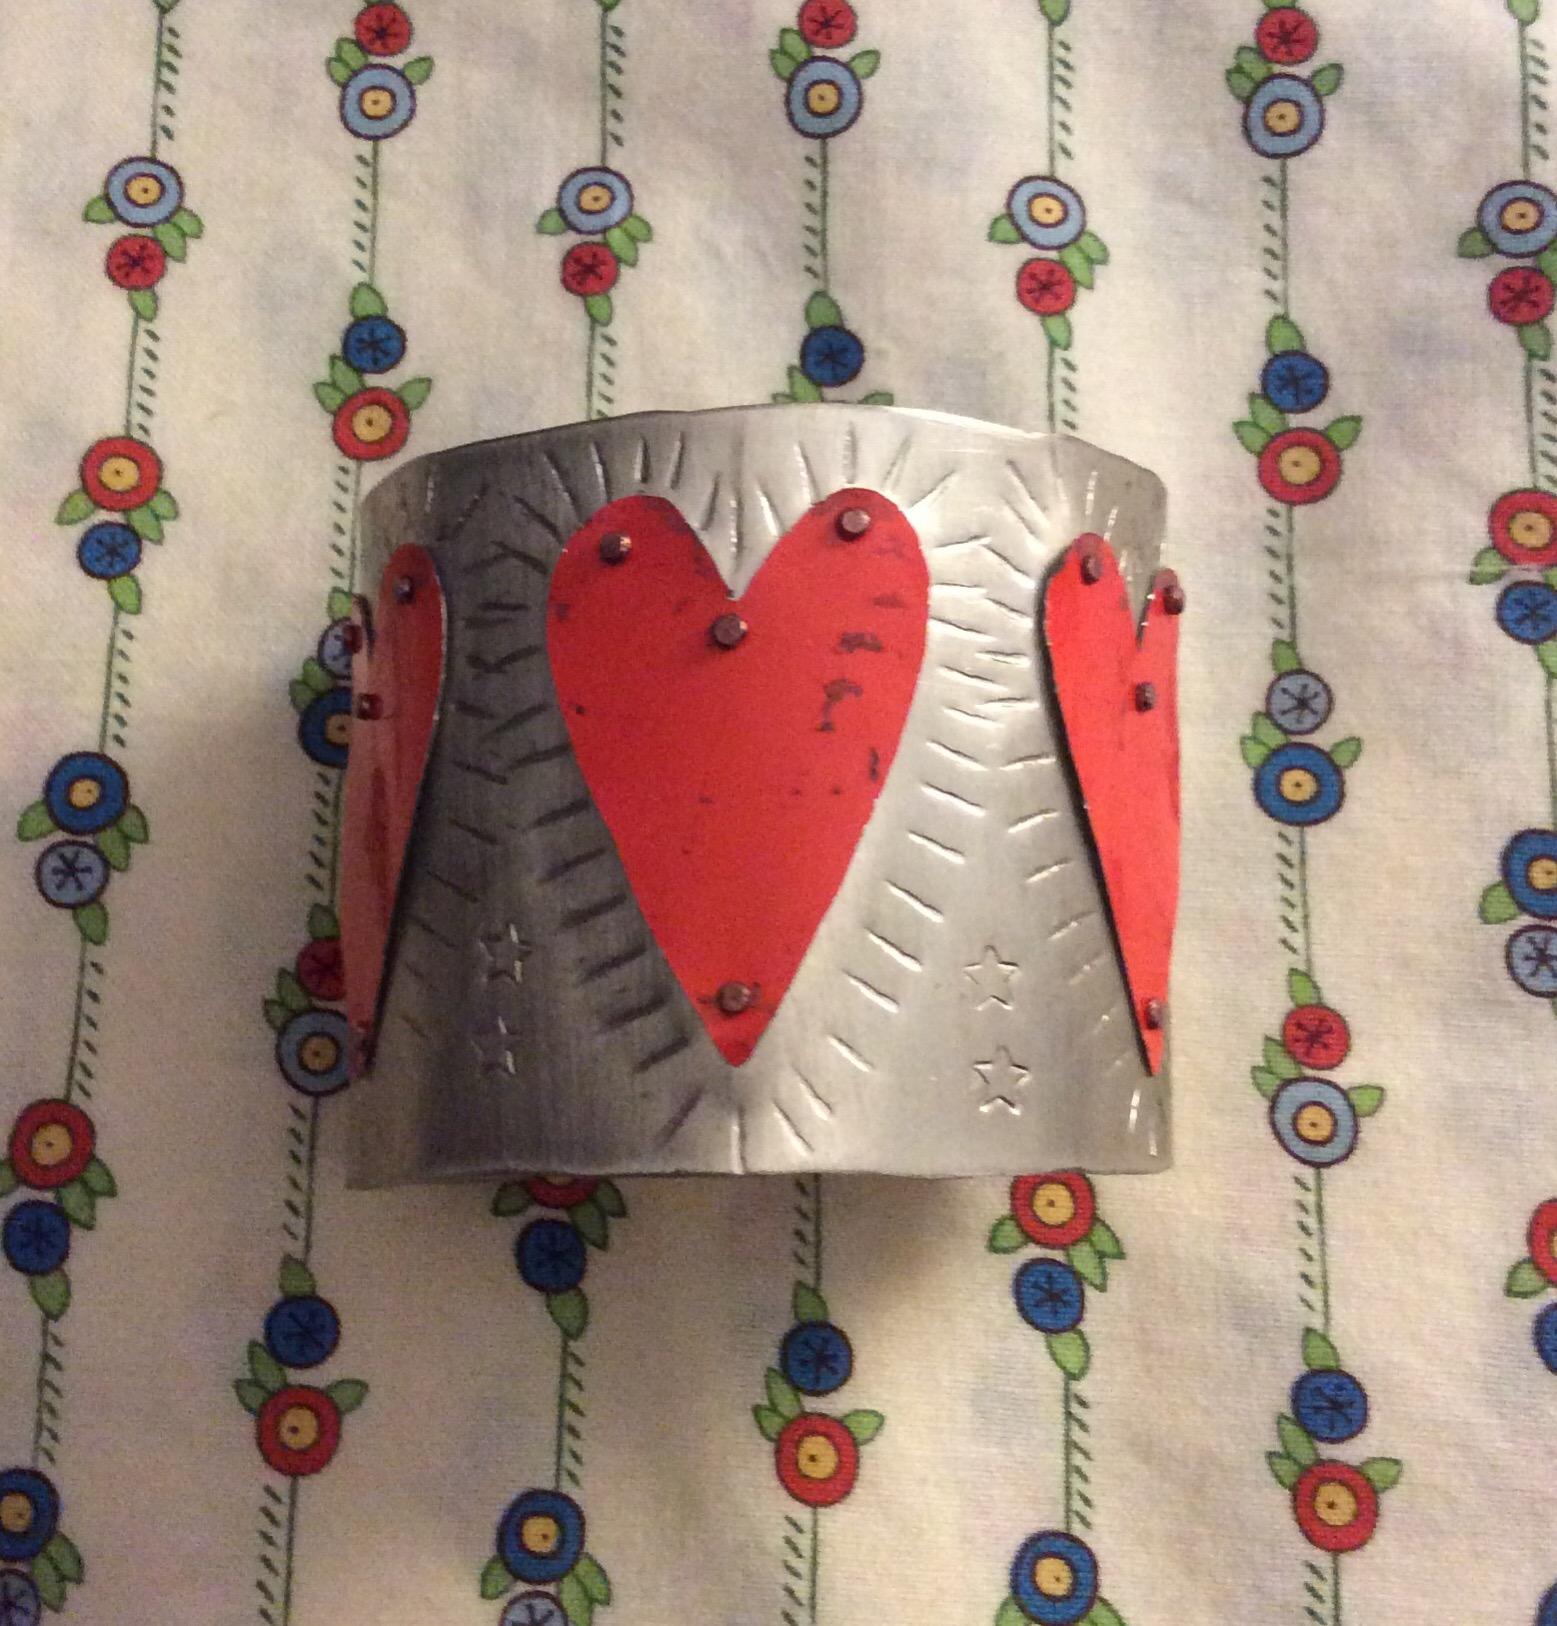 Christine Mundy • Heart Bracelet • Nickel, recycled tin • 2 x 2.5 Inches • Bracelet • 2018